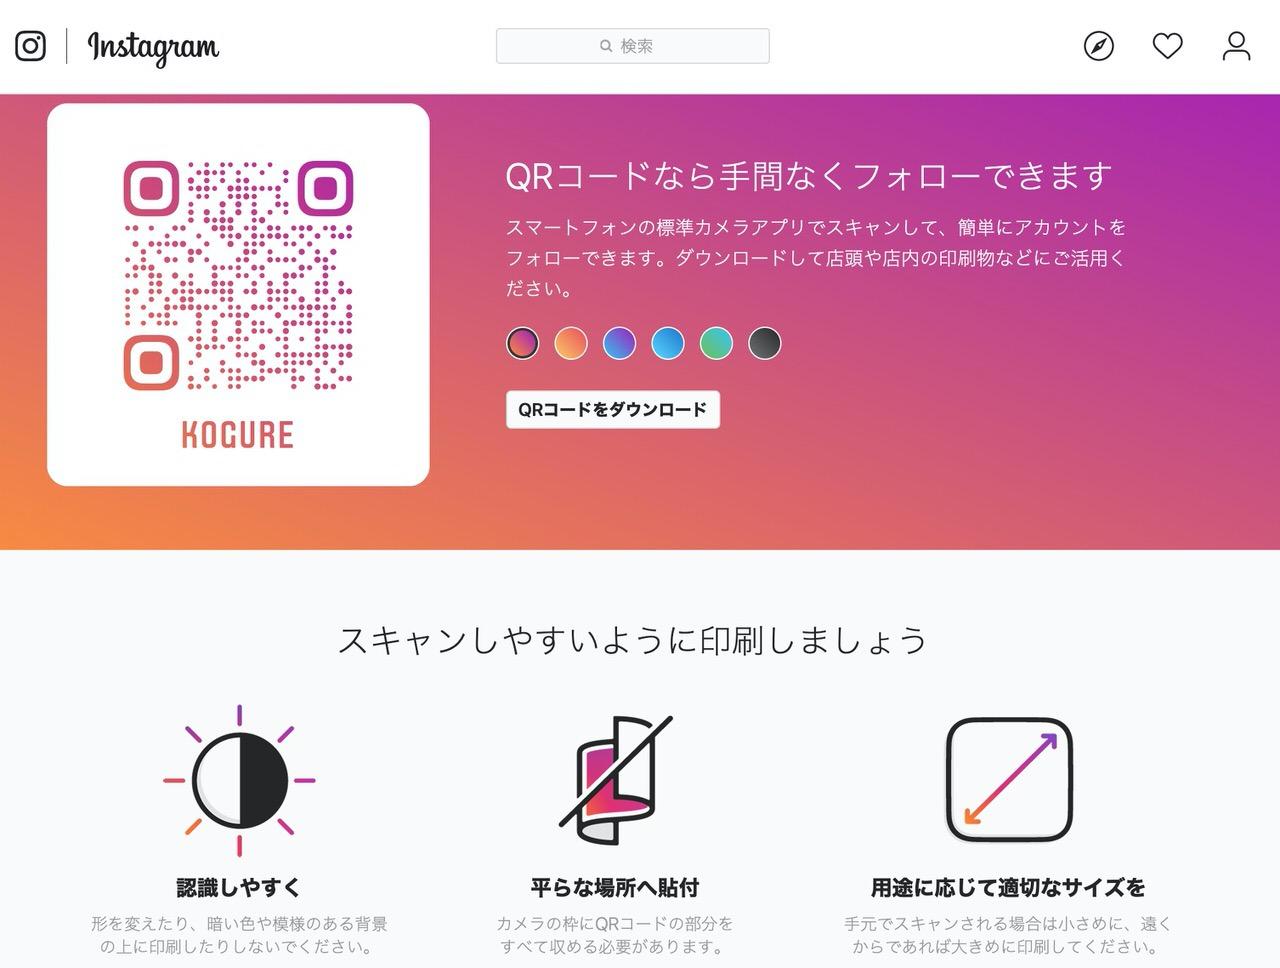 「Instagram」アプリ内で自分のQRコードを表示・QRコードをスキャンする機能を追加